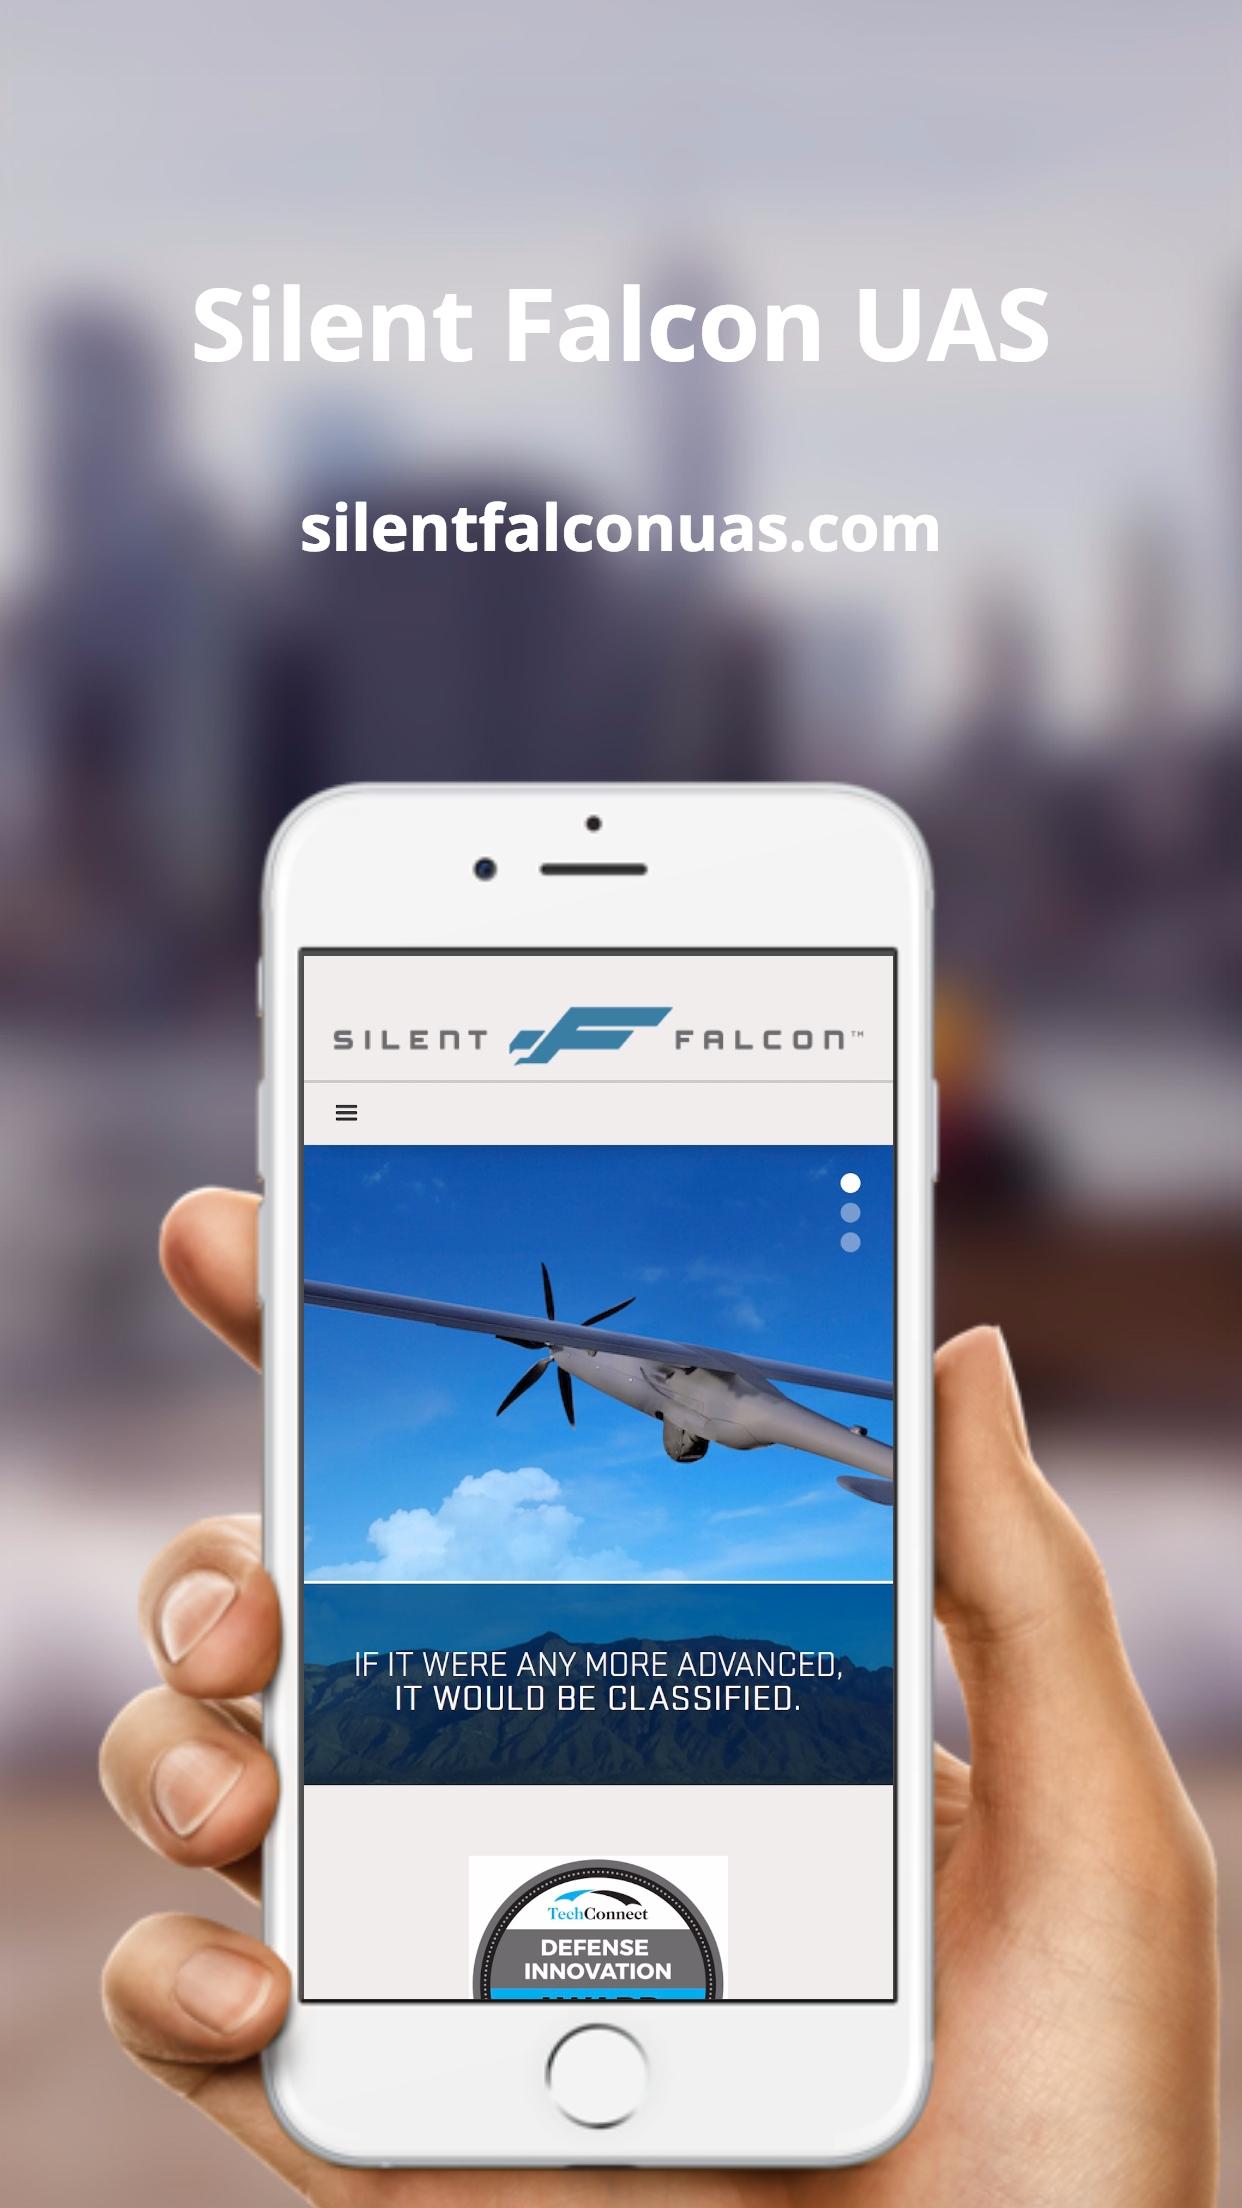 Silent Falcon UAS (iPhone)